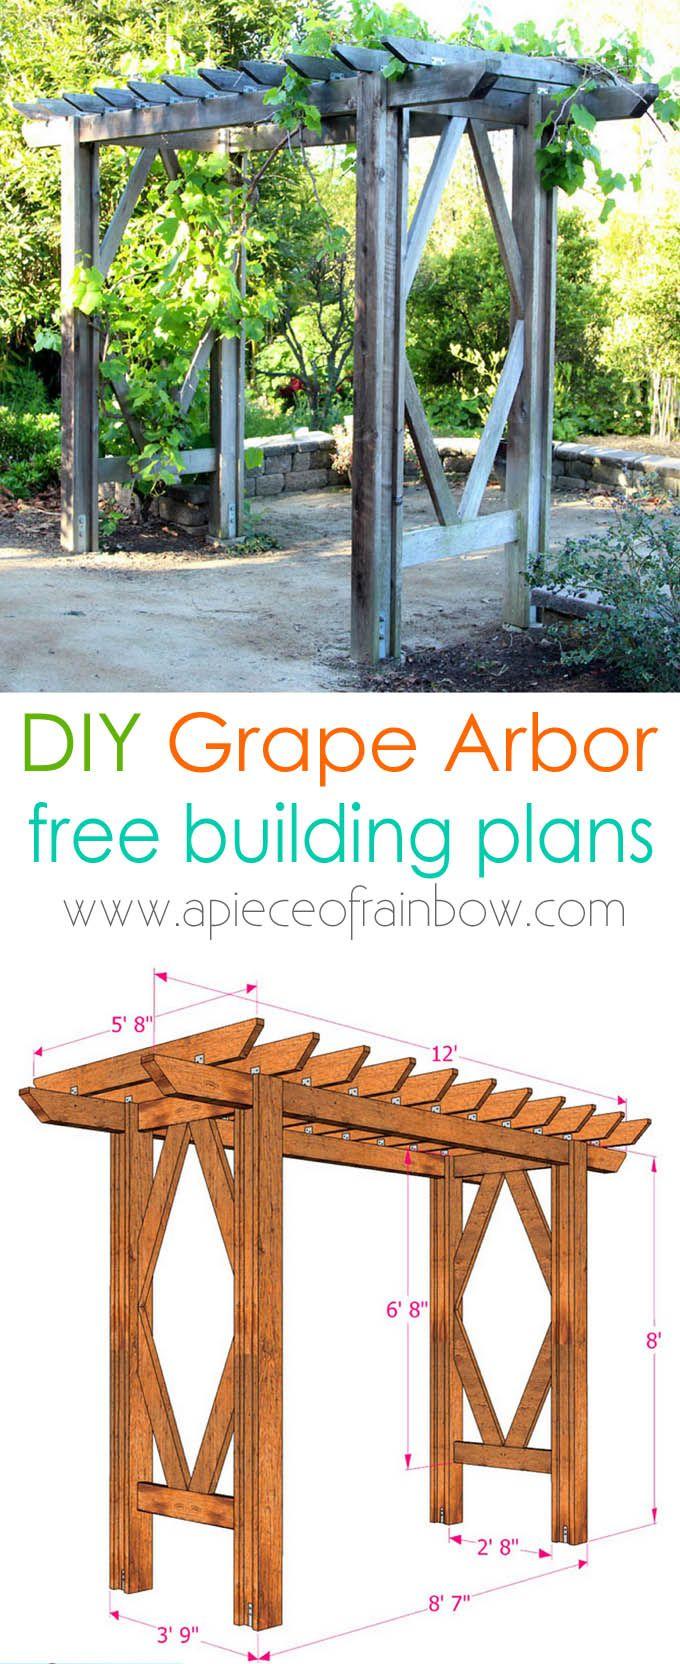 Simple Diy Pergola Grape Arbor Free Building Plan Diy Garden Trellis Diy Arbour Diy Pergola